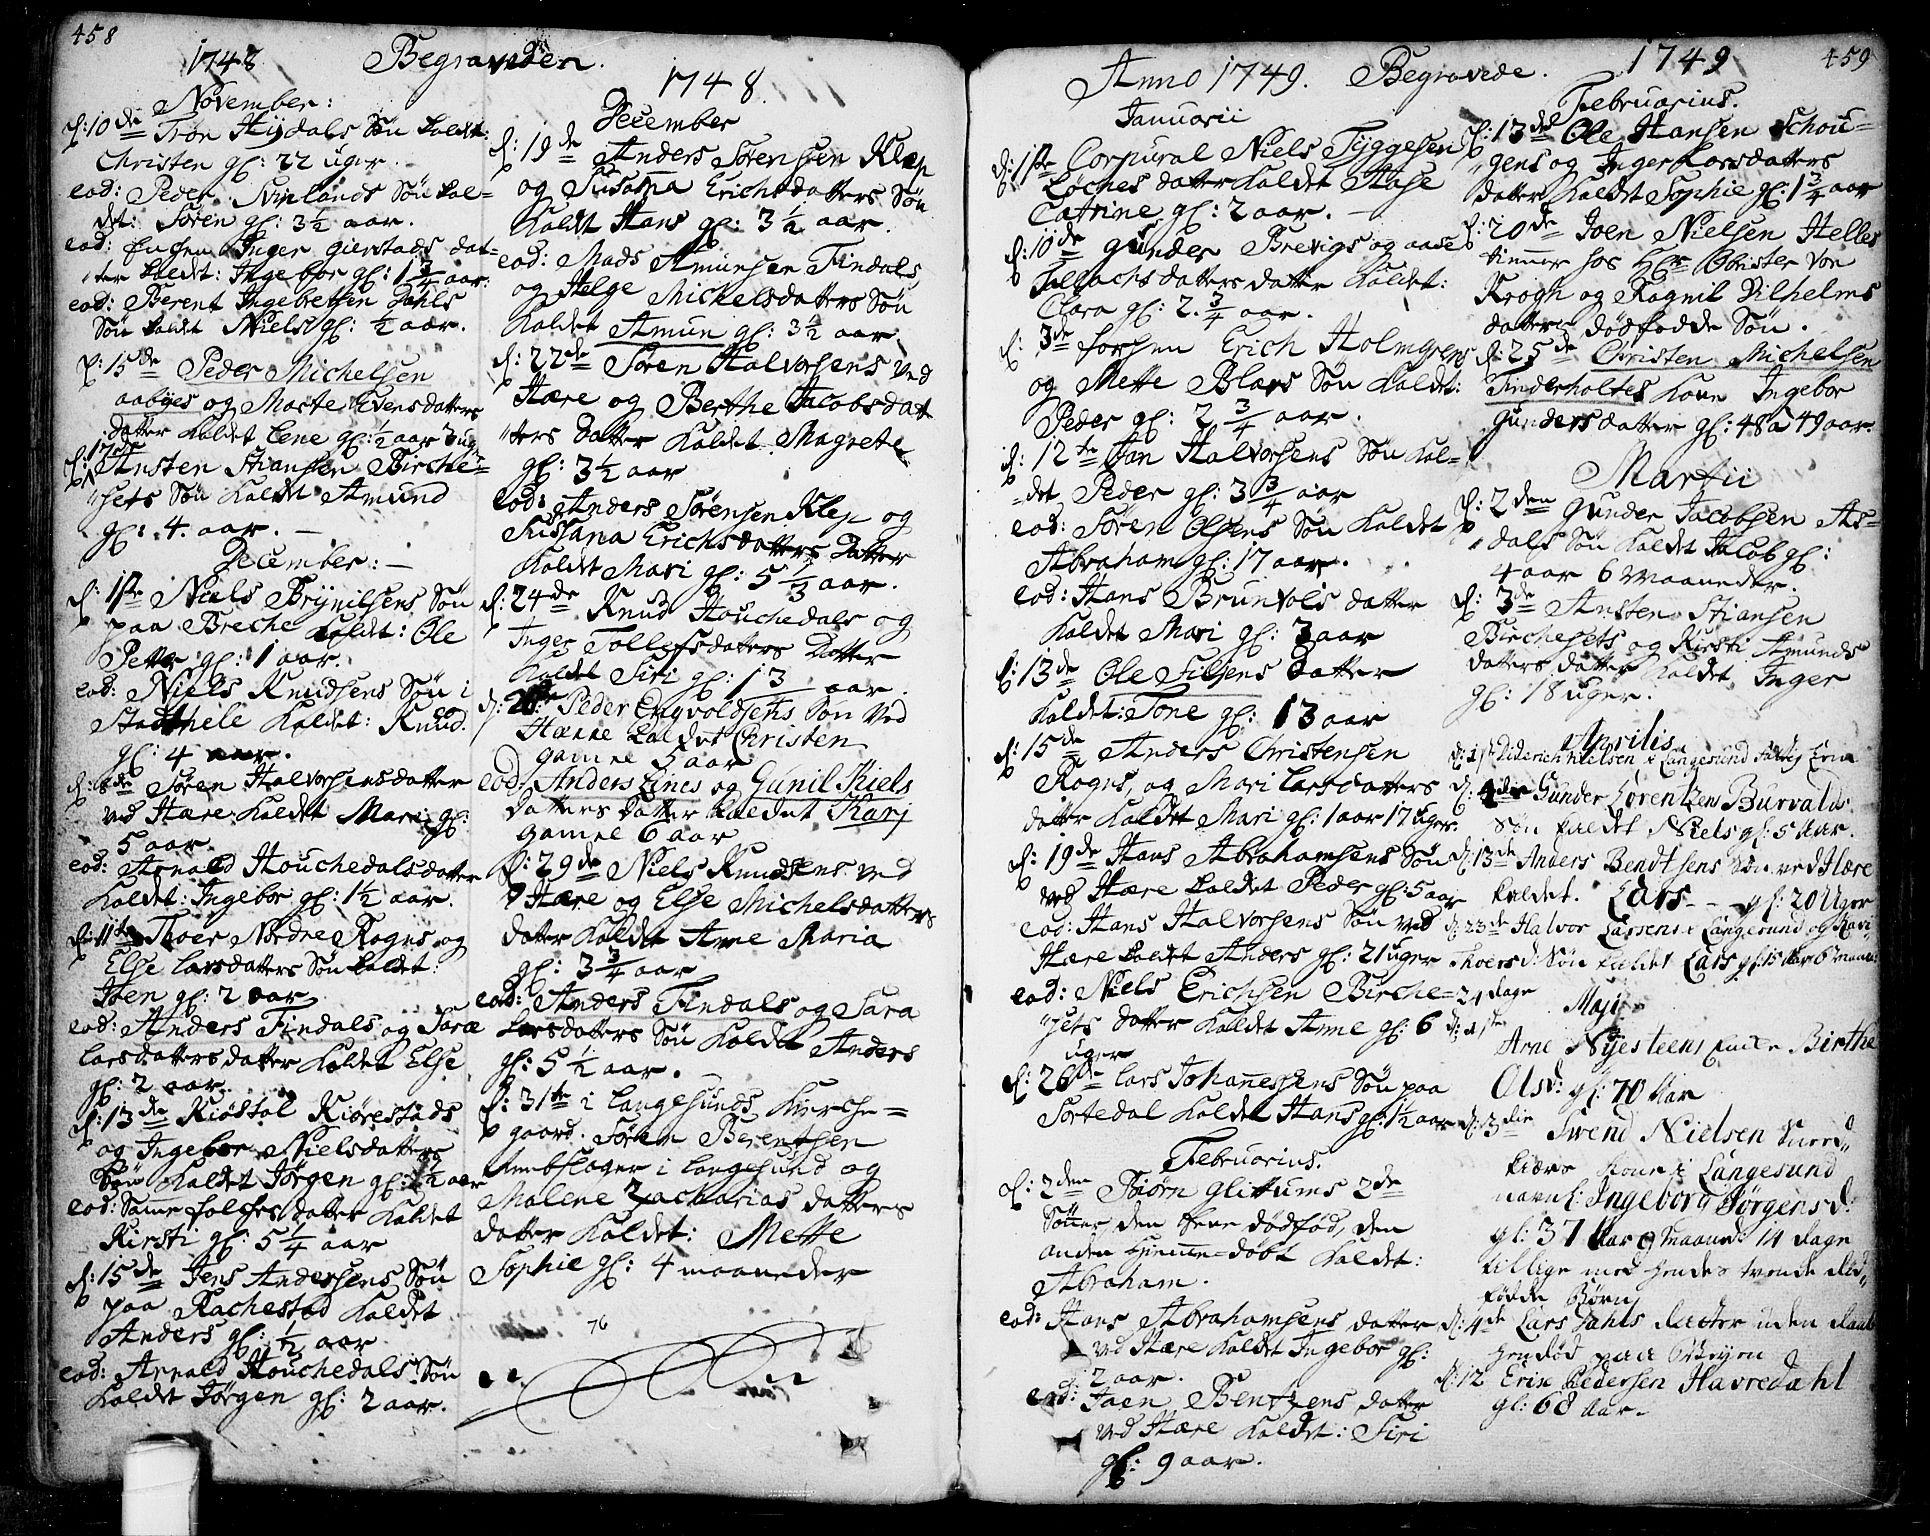 SAKO, Bamble kirkebøker, F/Fa/L0001: Ministerialbok nr. I 1, 1702-1774, s. 458-459